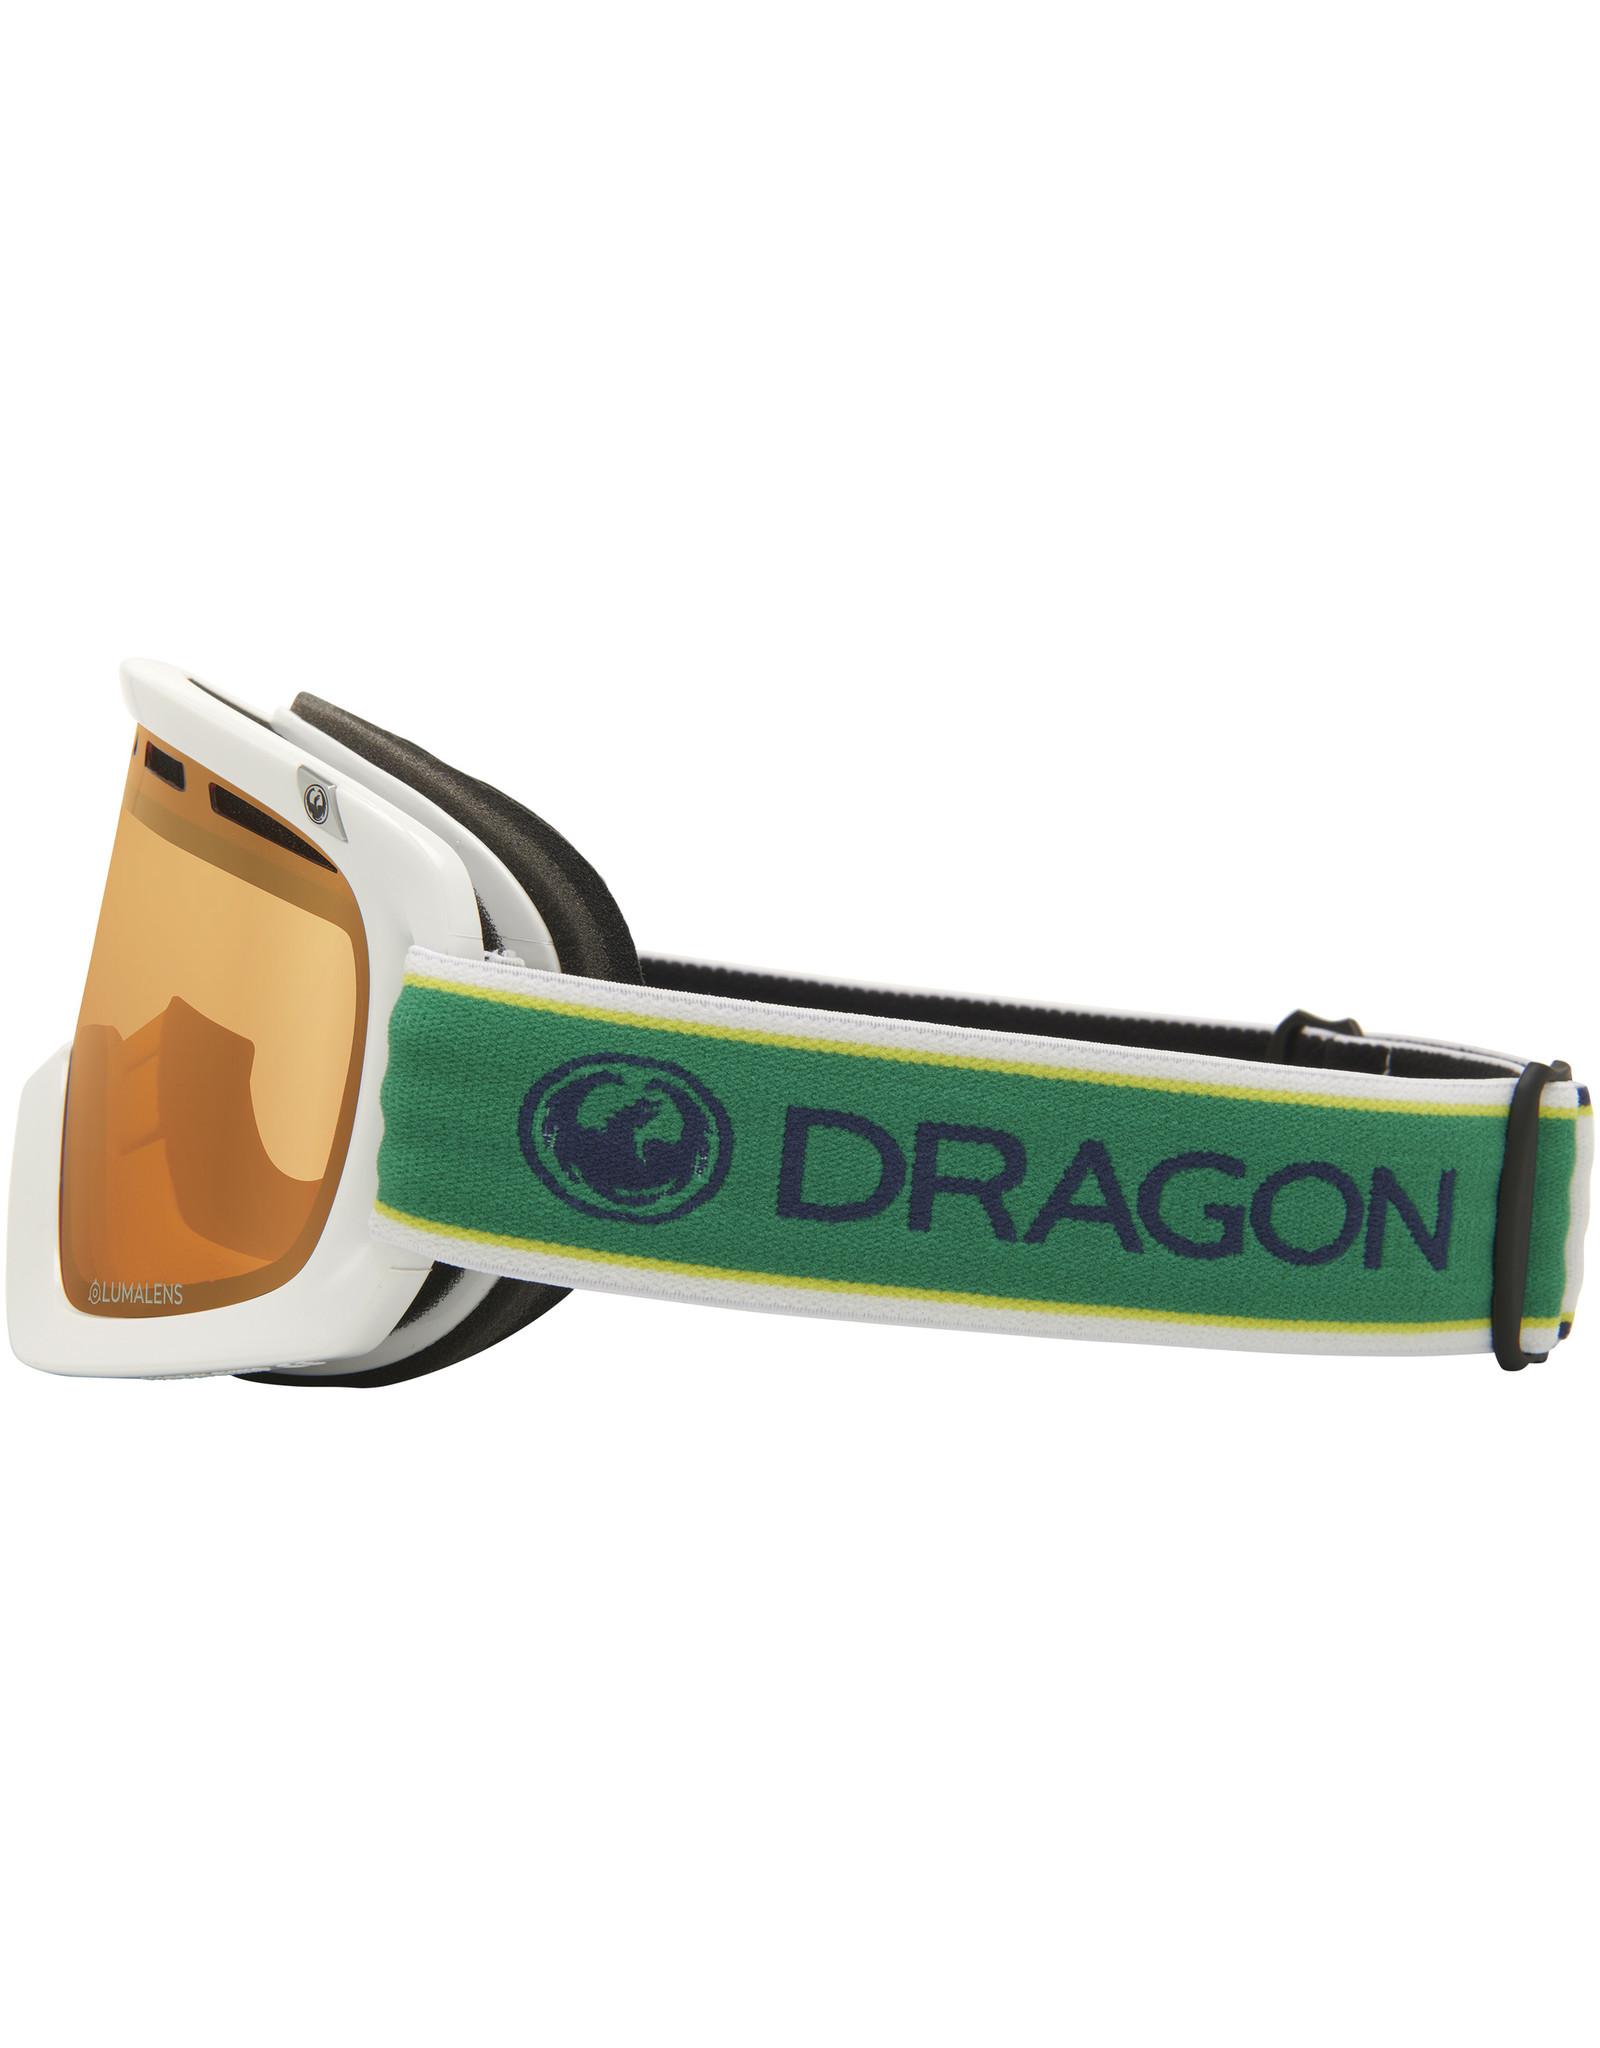 DRAGON DRAGON - D1 OTG POLO CLUB - AMBER - 19/20